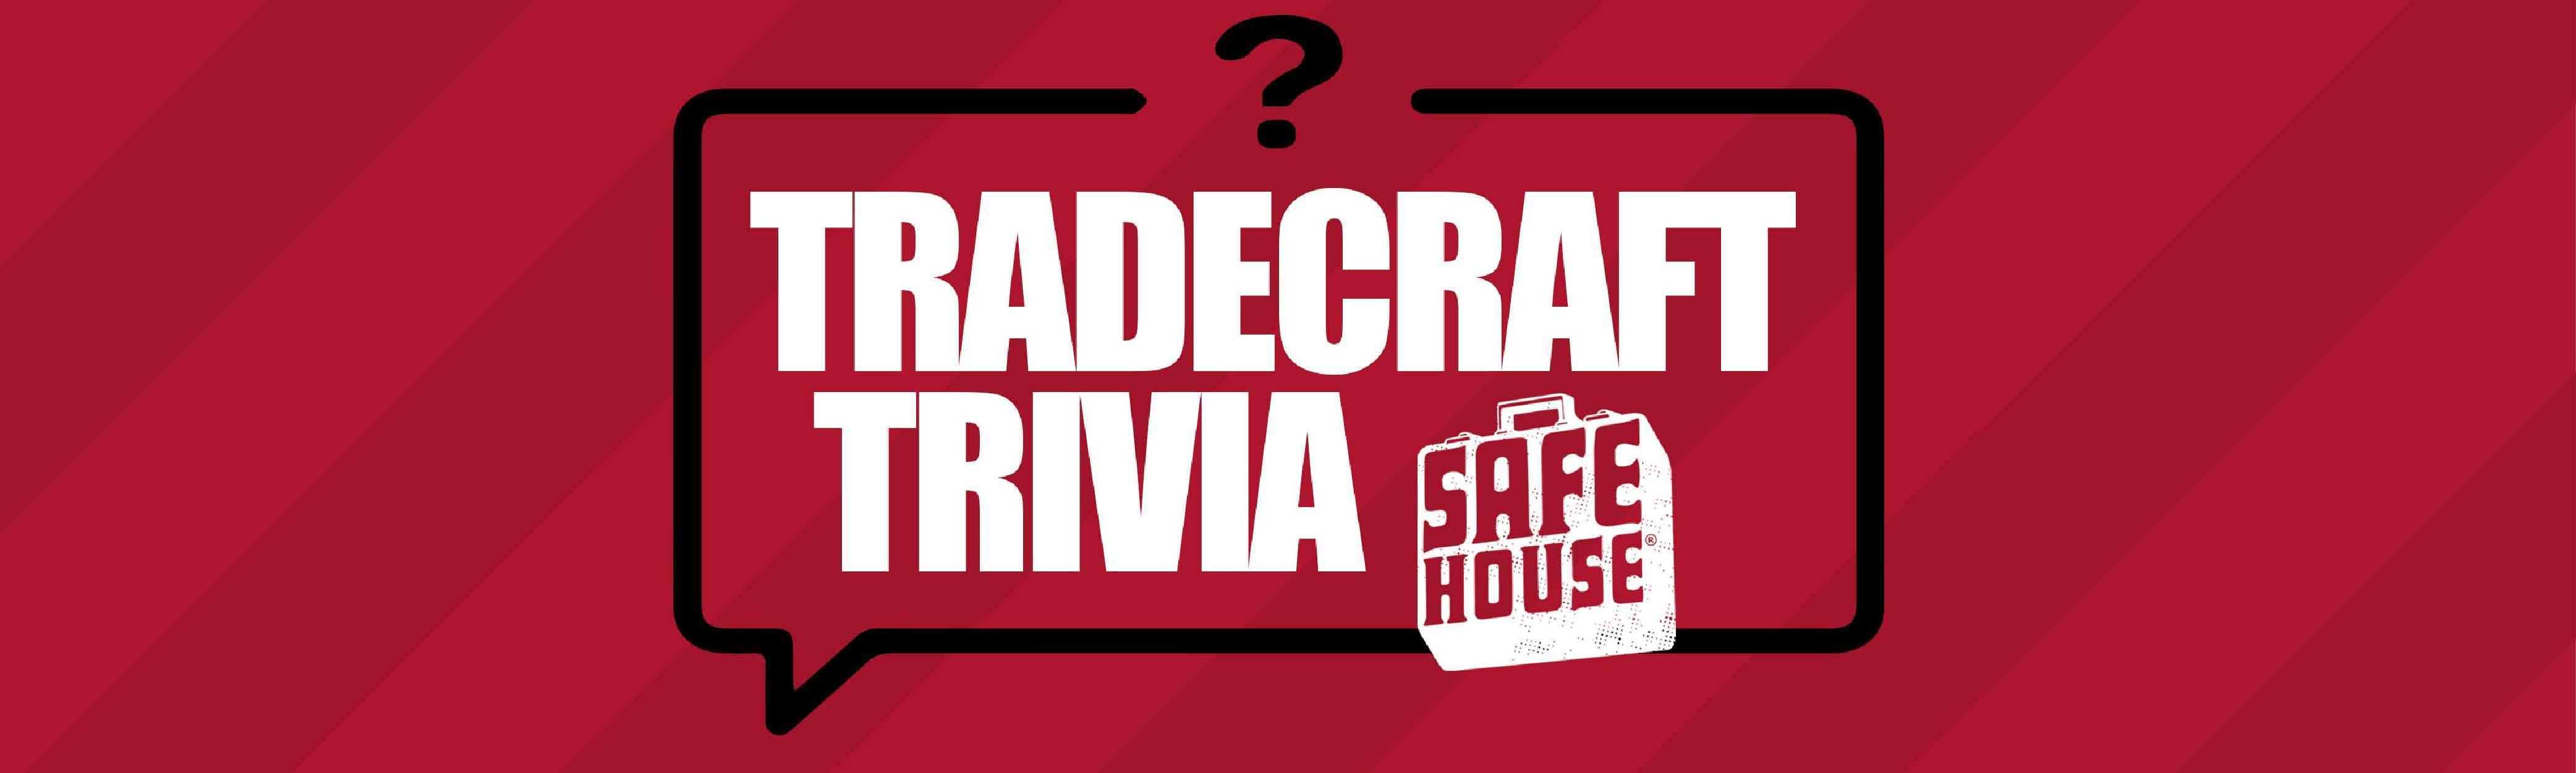 Tradecraft Trivia